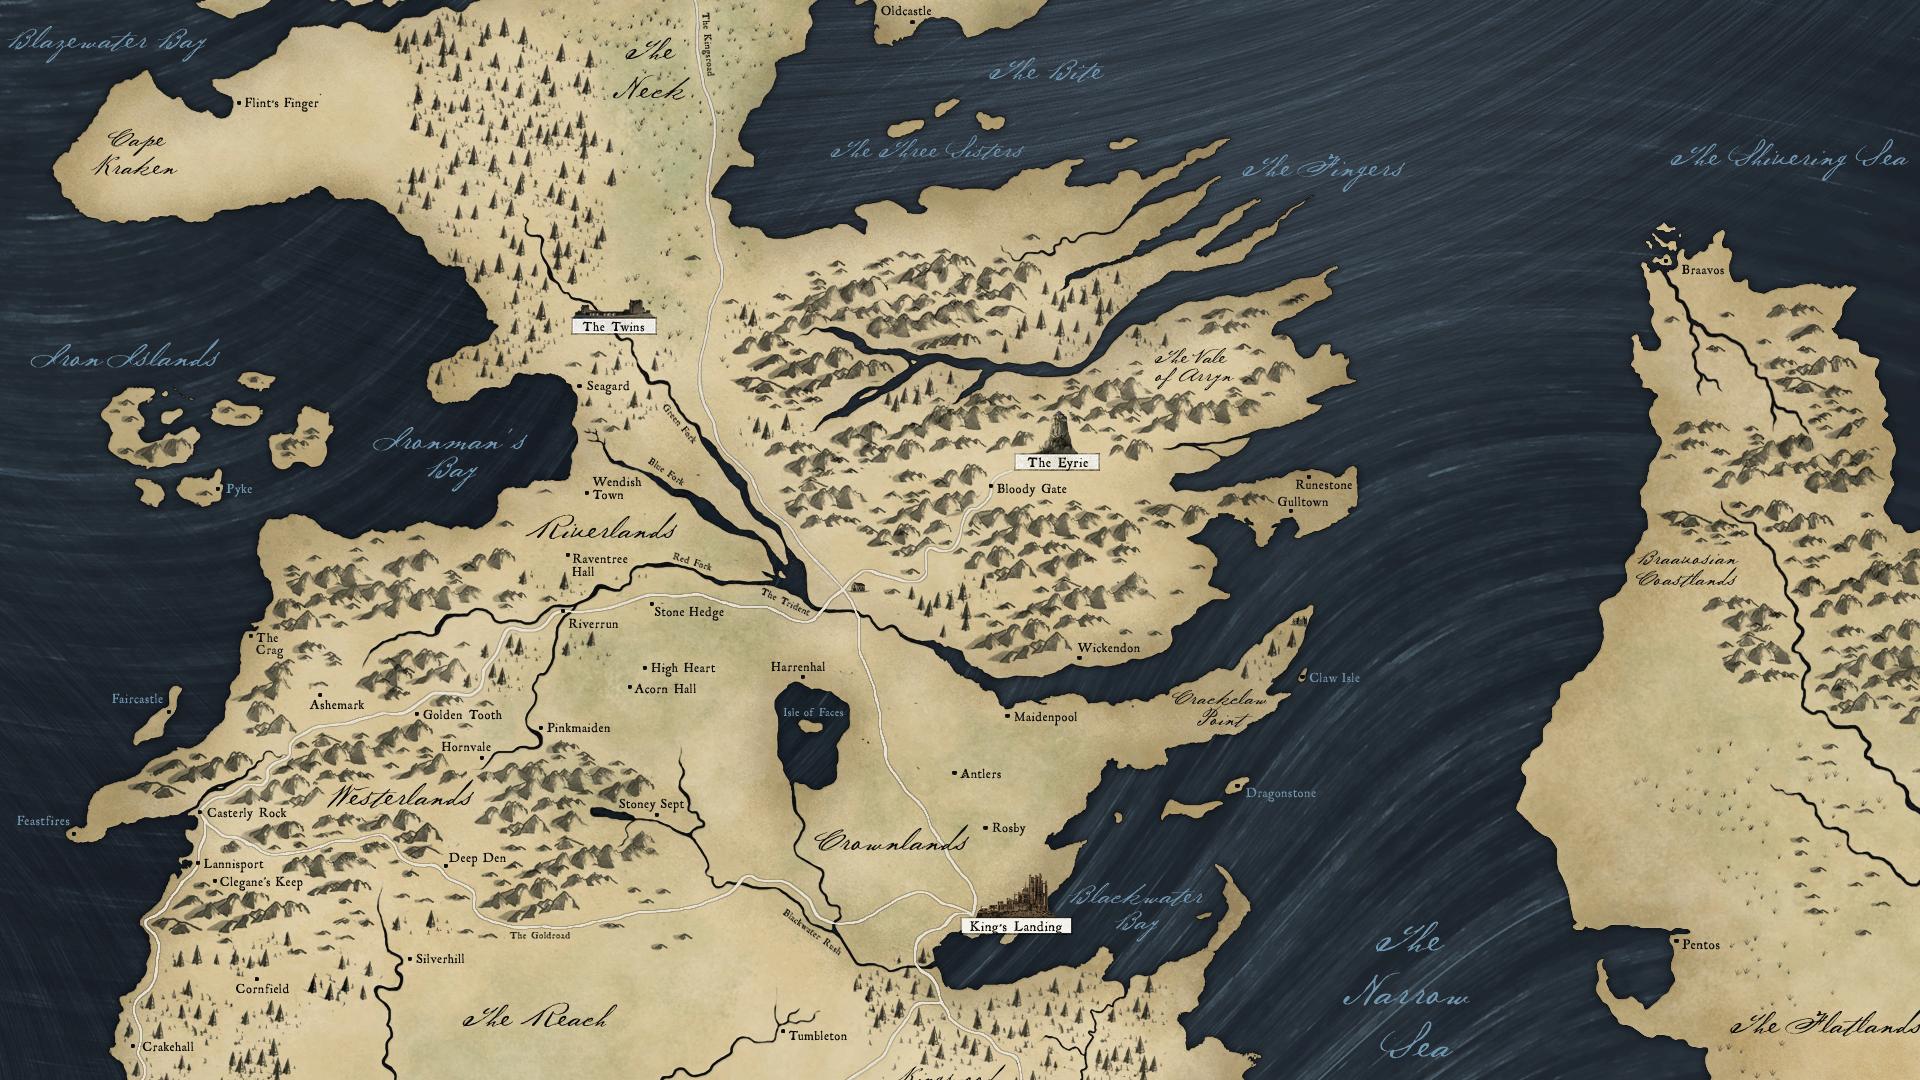 Westeros Karte Hd.45 Game Of Thrones Map Wallpaper On Wallpapersafari